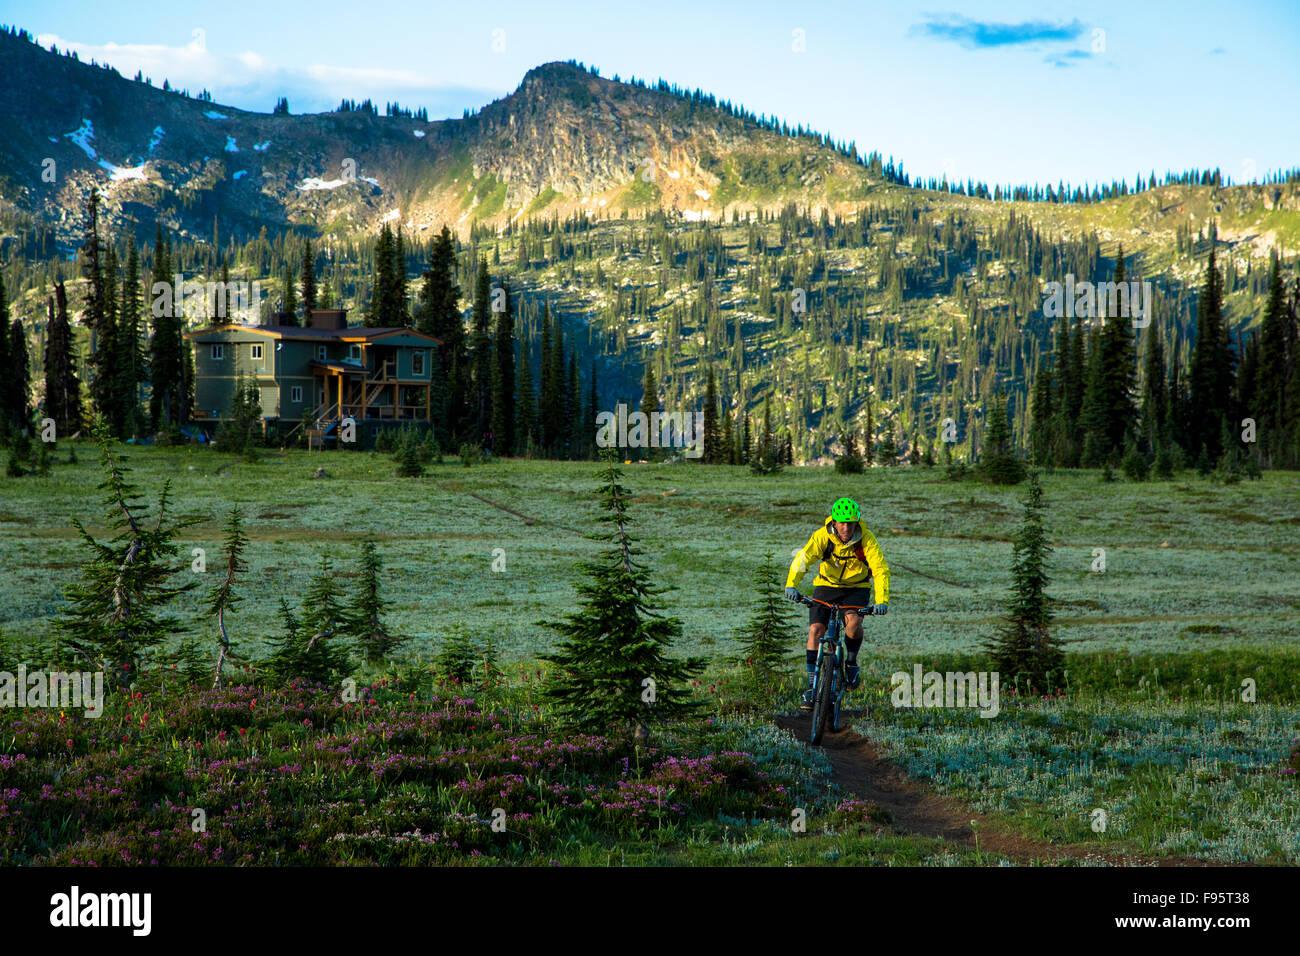 Mountain Biking, Monashee Mountains, Sol Mountain Lodge, British Columbia, Canada, - Stock Image